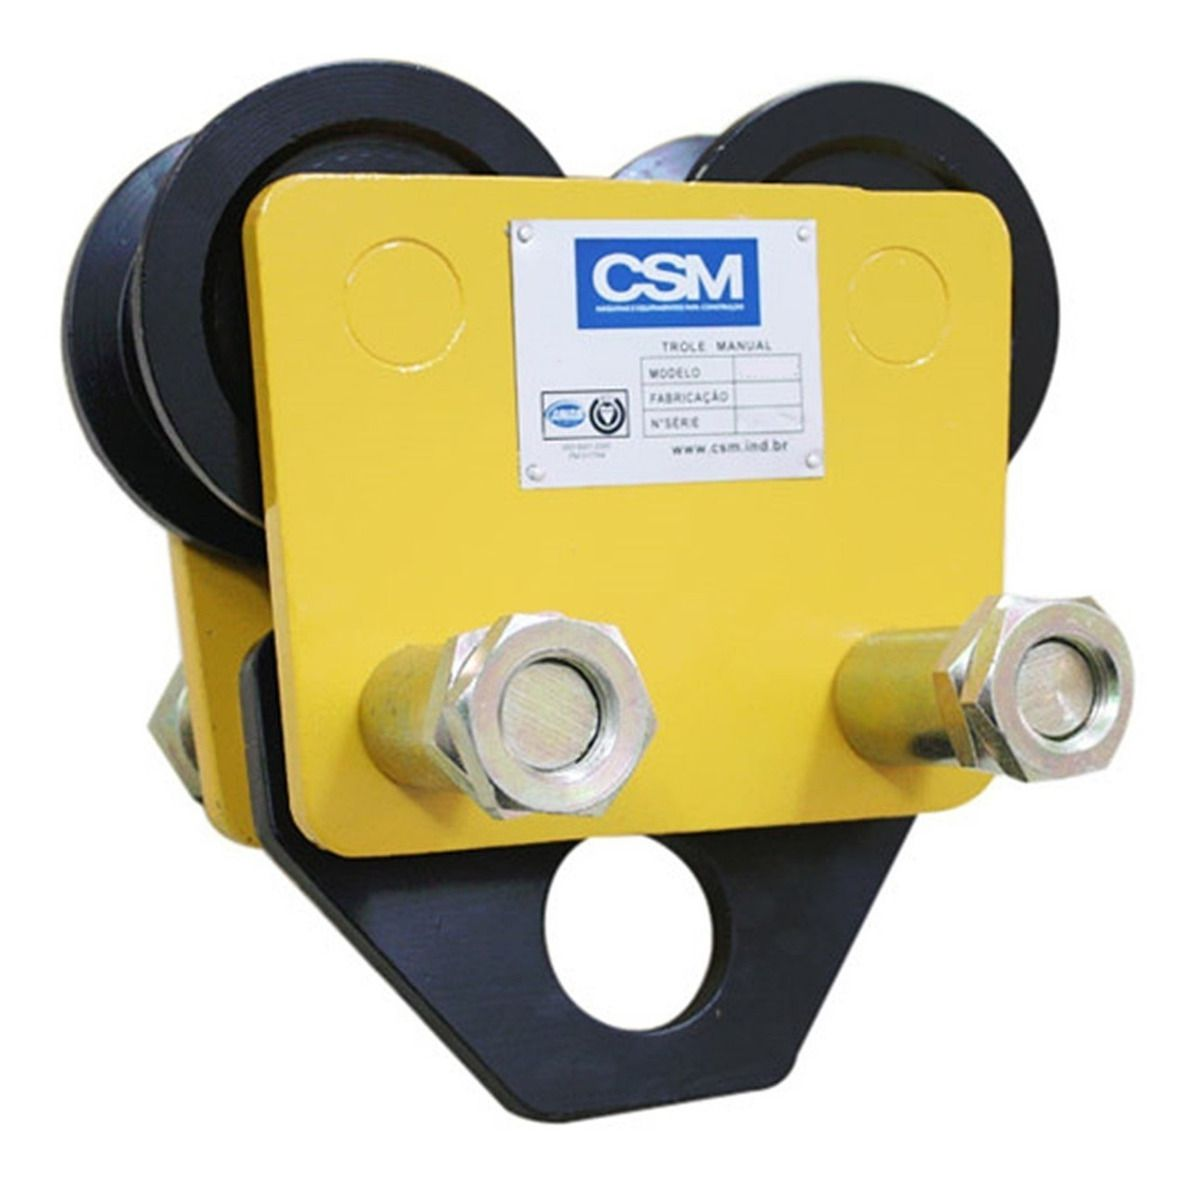 Trole Manual 500 kg CSM (T-500)